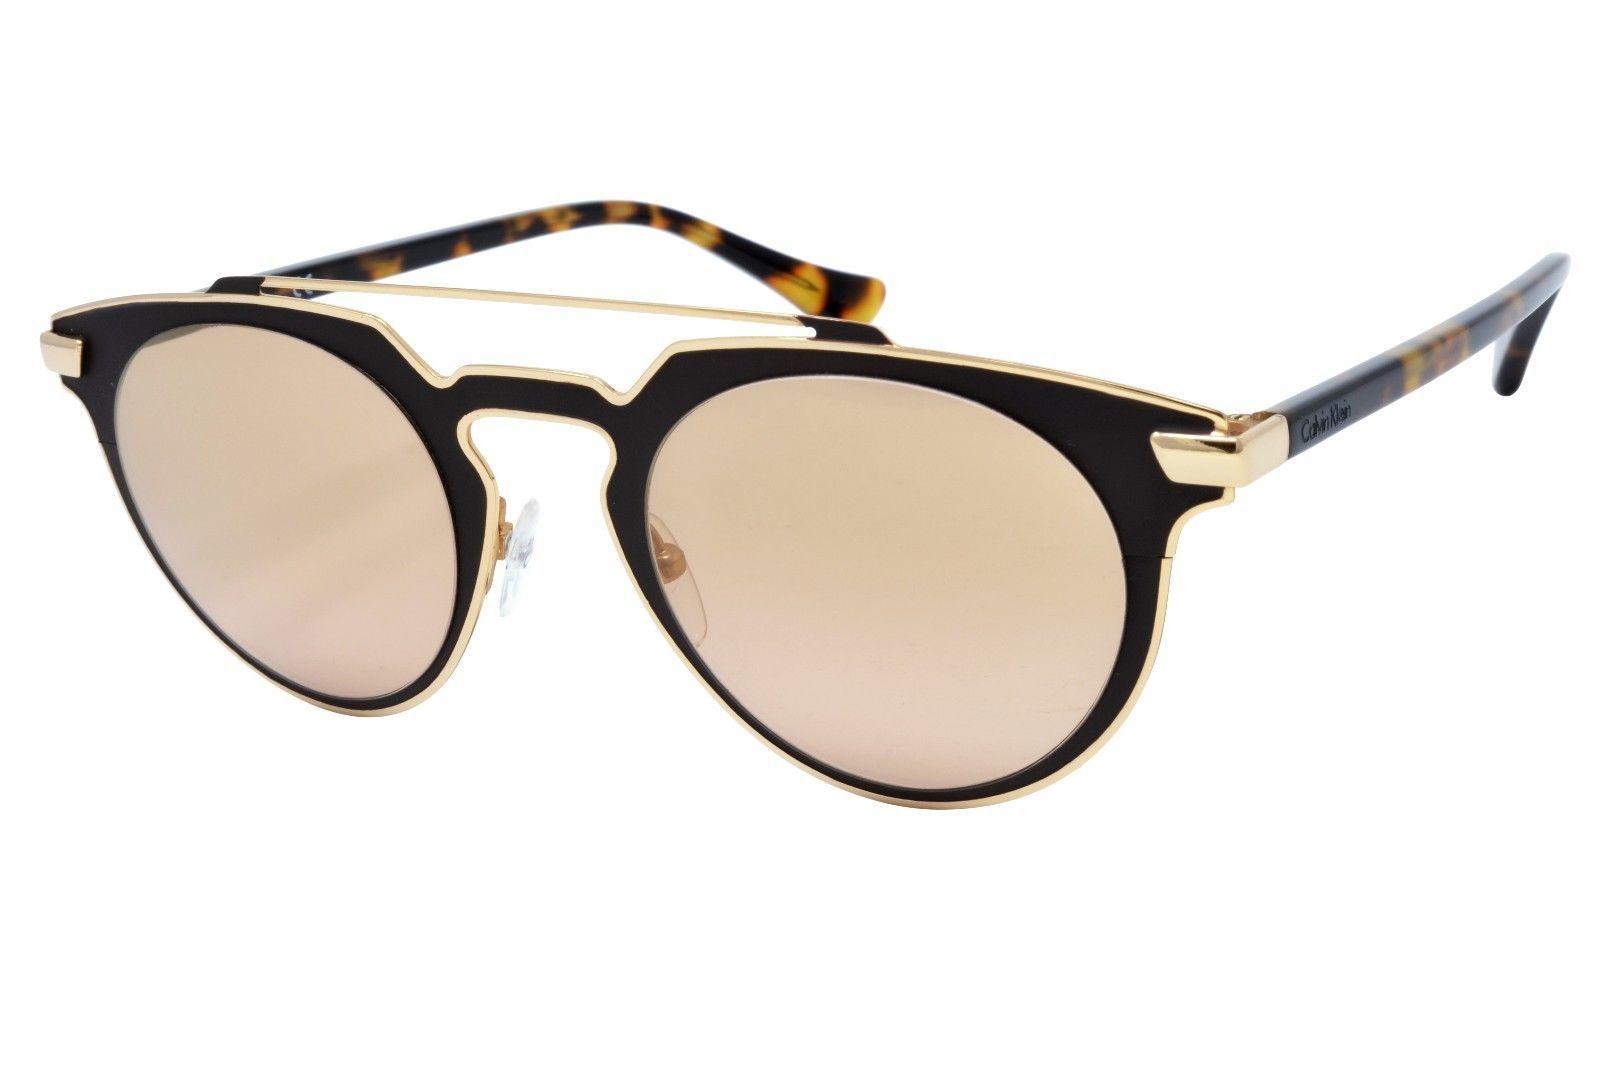 33fe5c4013 NEW Calvin Klein Women s Ck2147s 210 Round Sunglasses